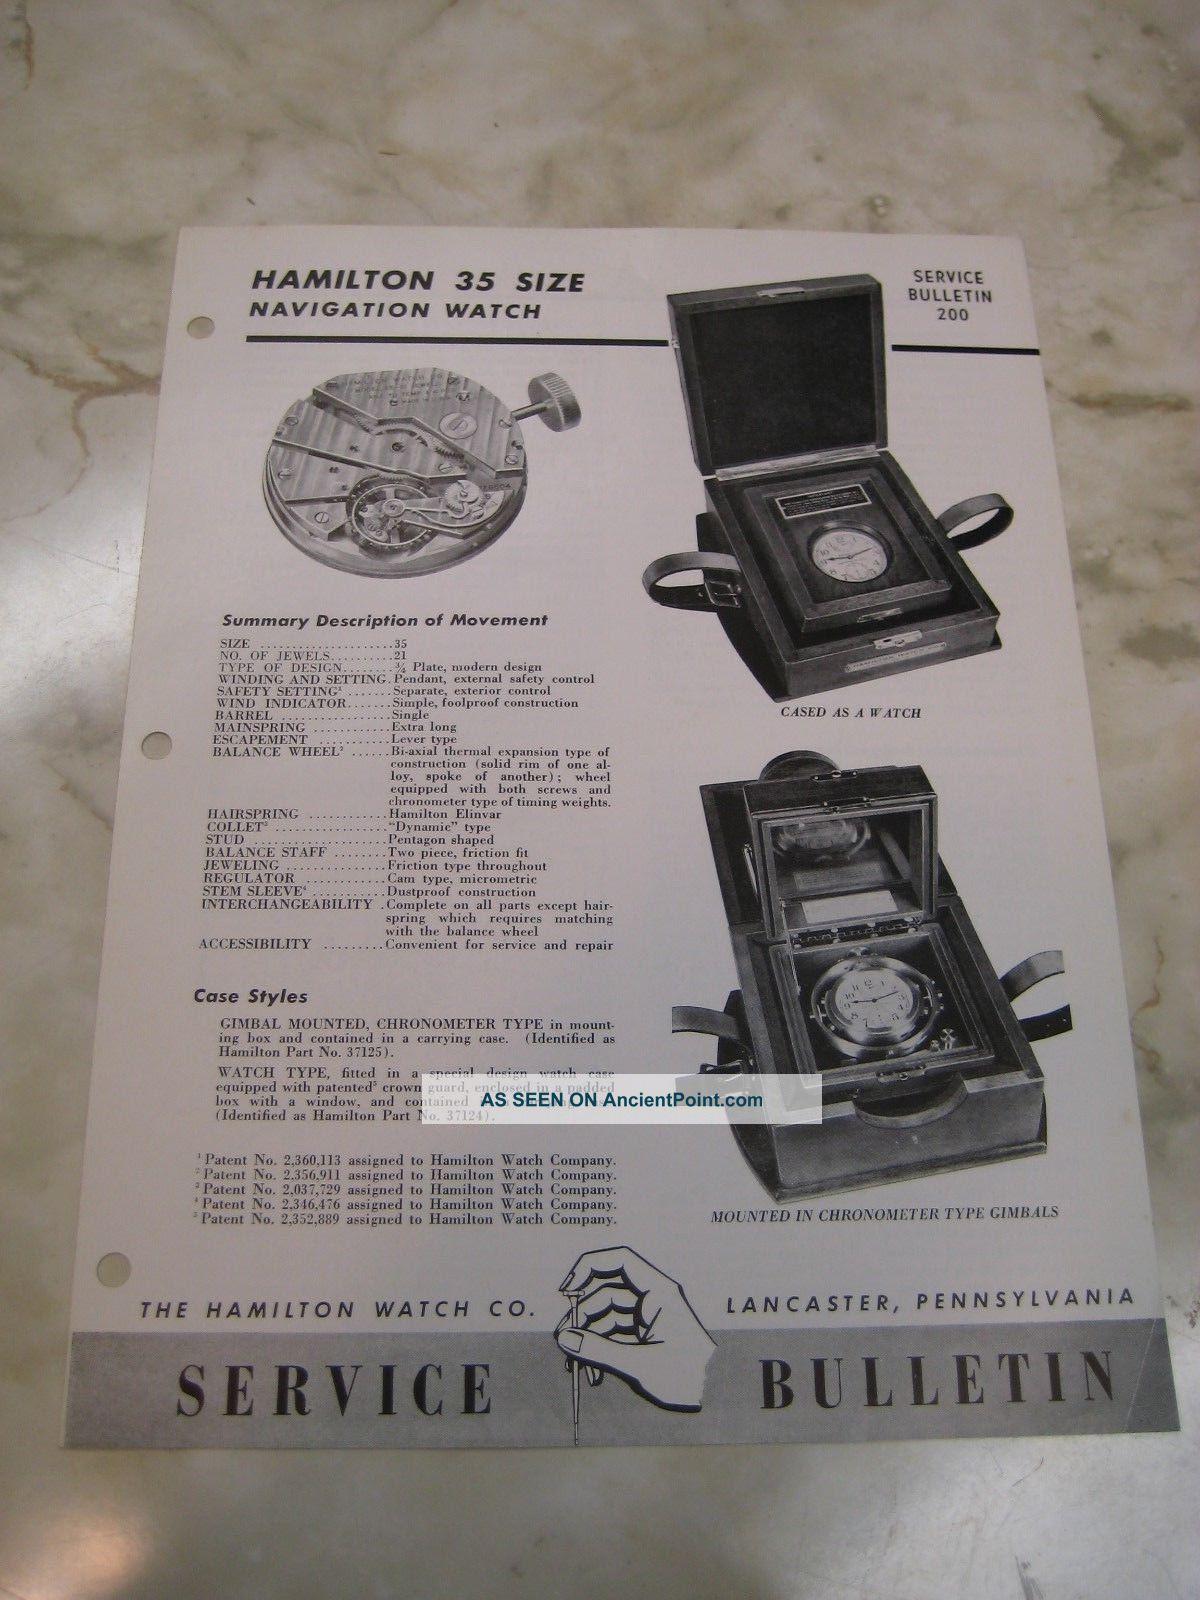 1946 Hamilton Watch - Model 22 - Deck Navigation Chronometer - Service Bulletin Clocks photo